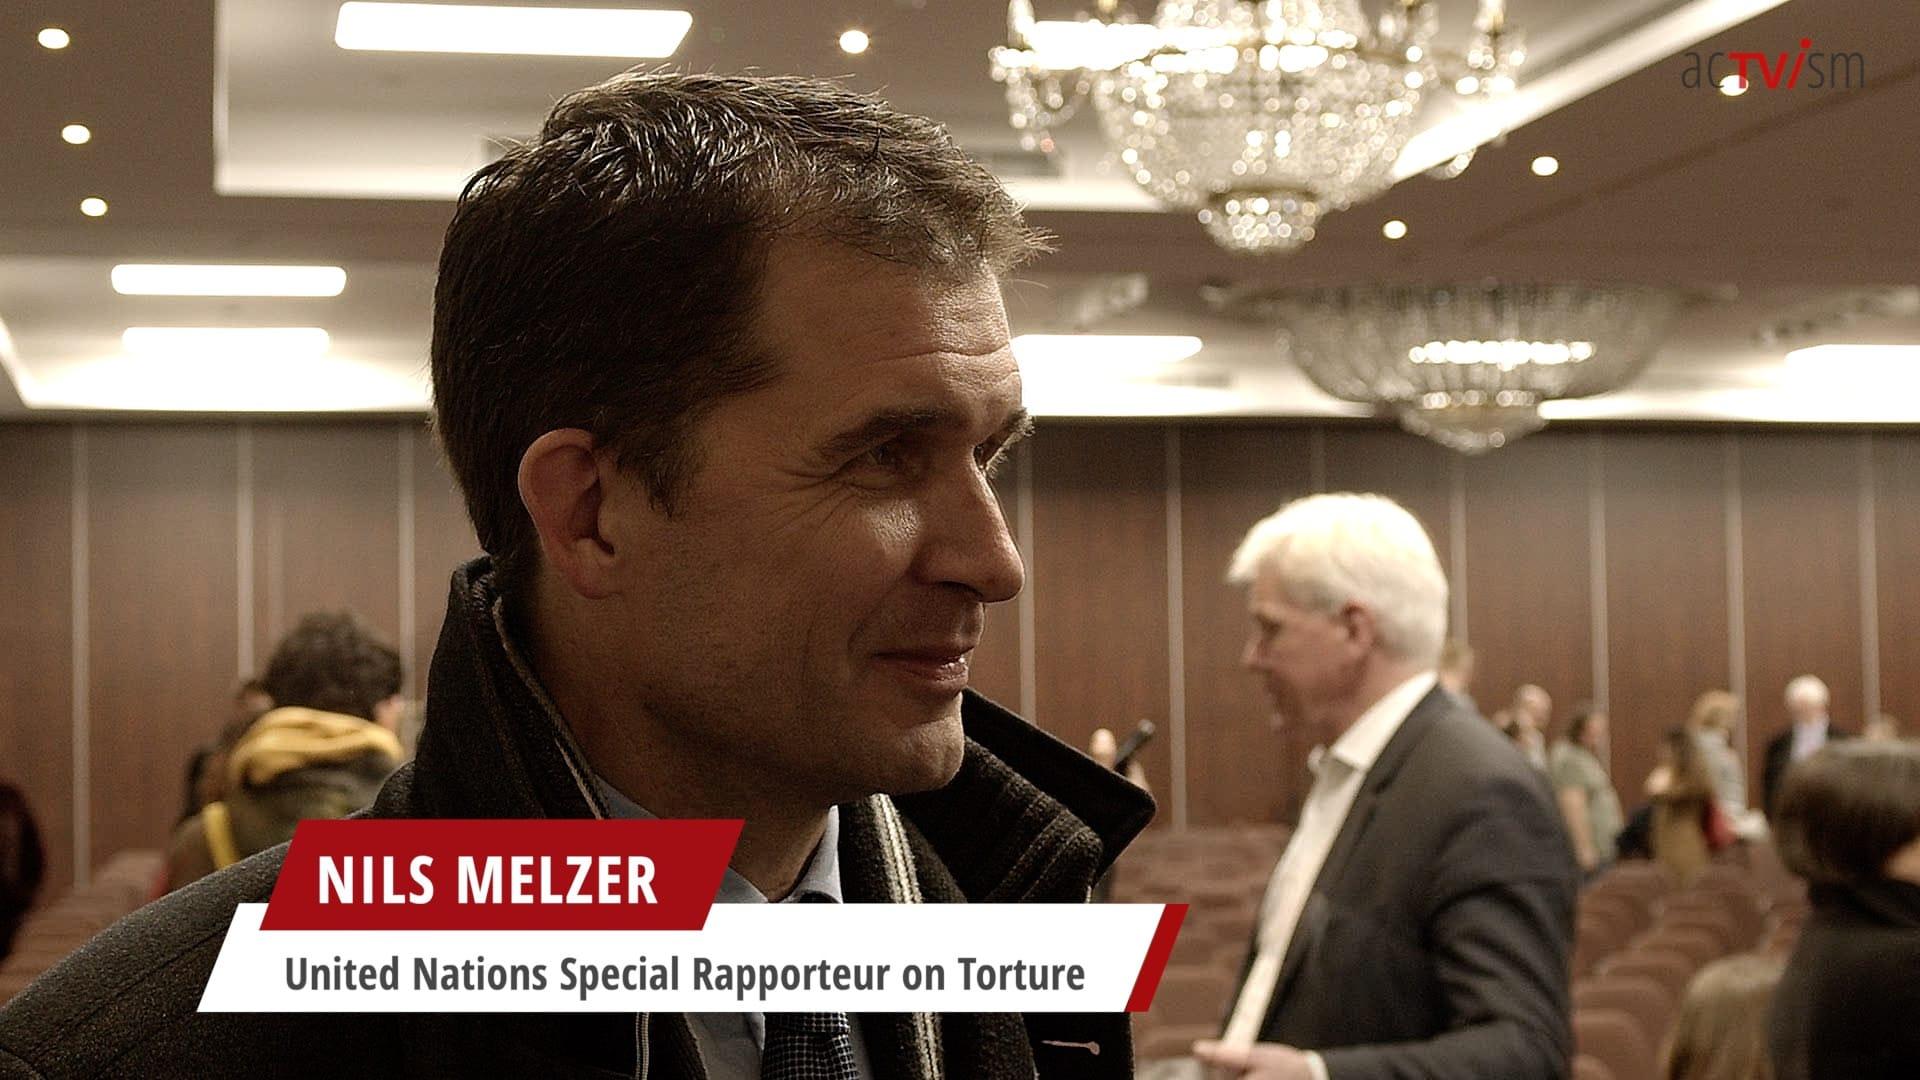 Nils Melzer Julian Assange